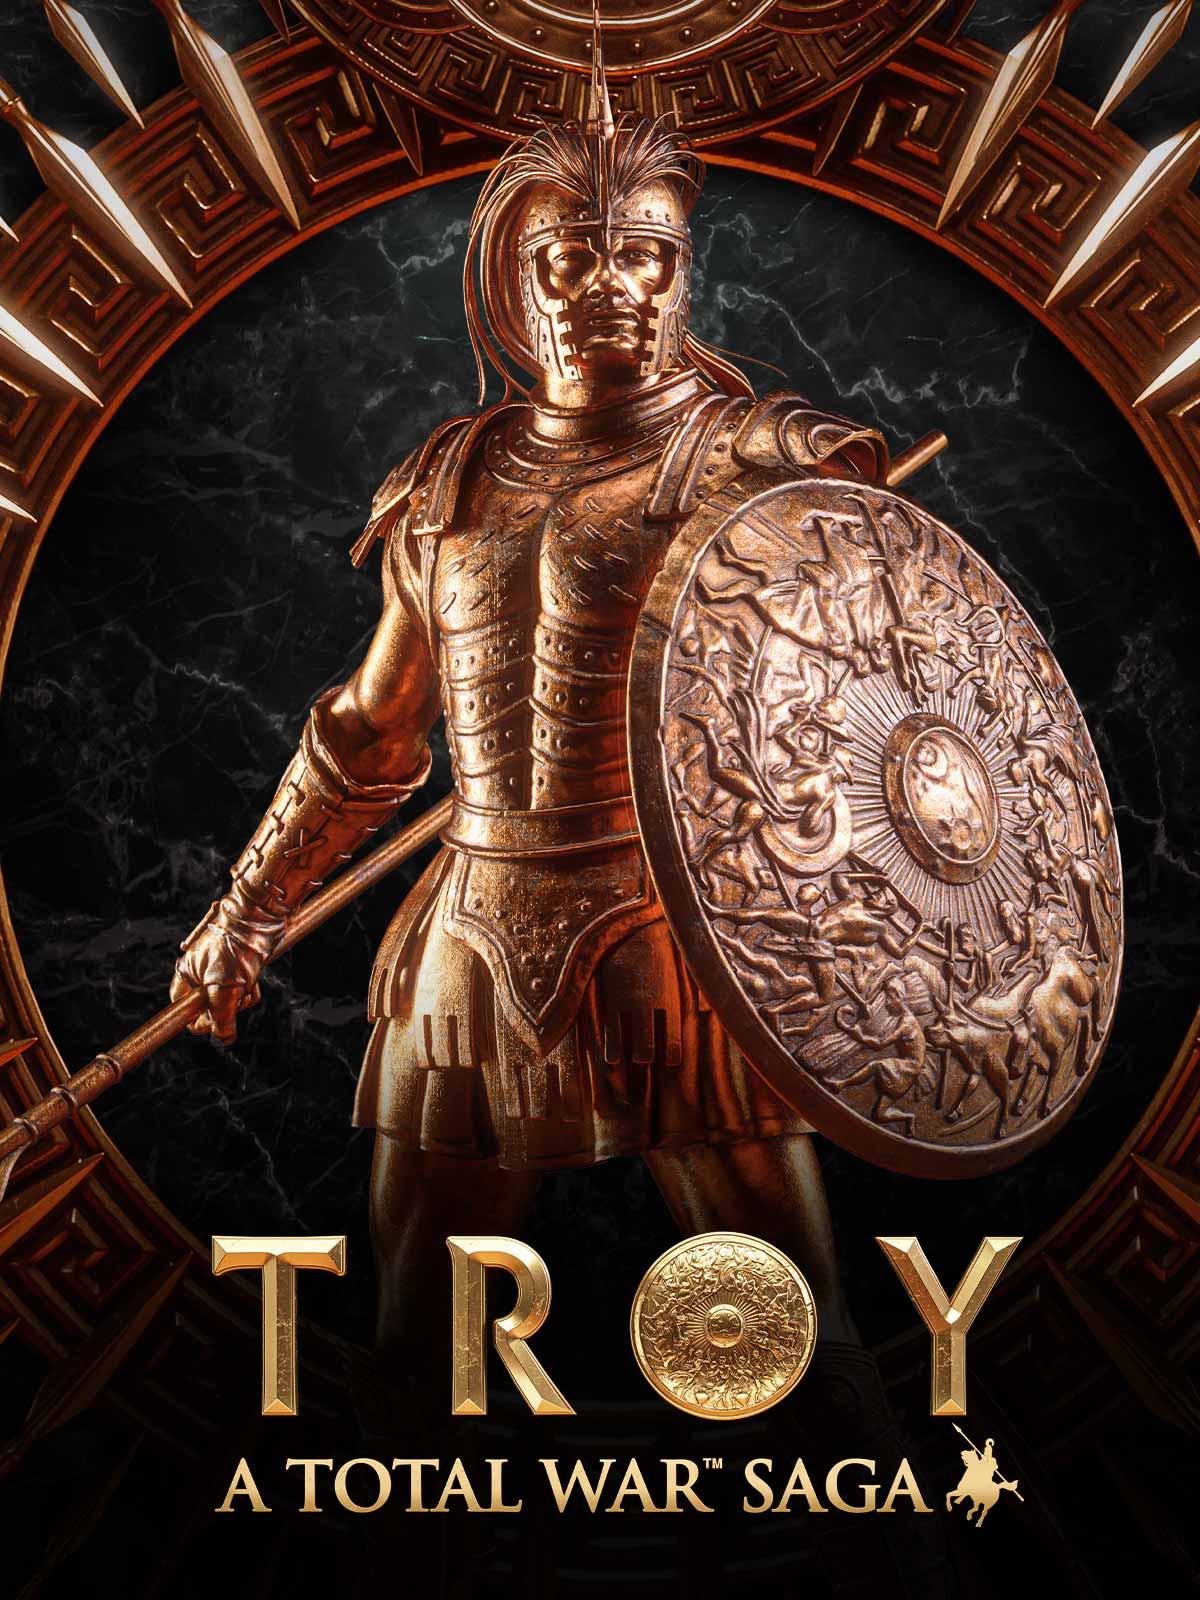 Epic Games: Total war troy epic games